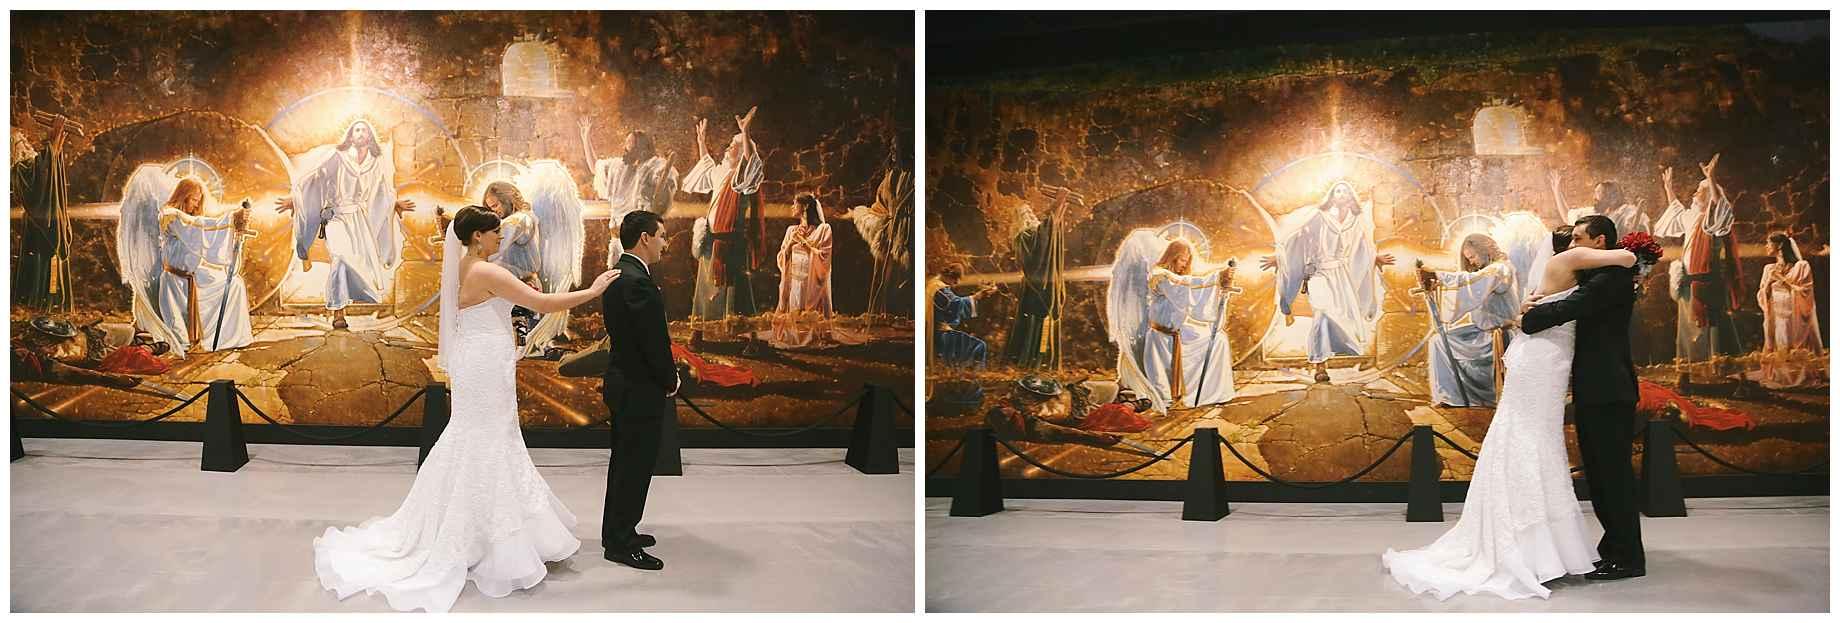 museum-of-biblical-art-wedding-photos-04